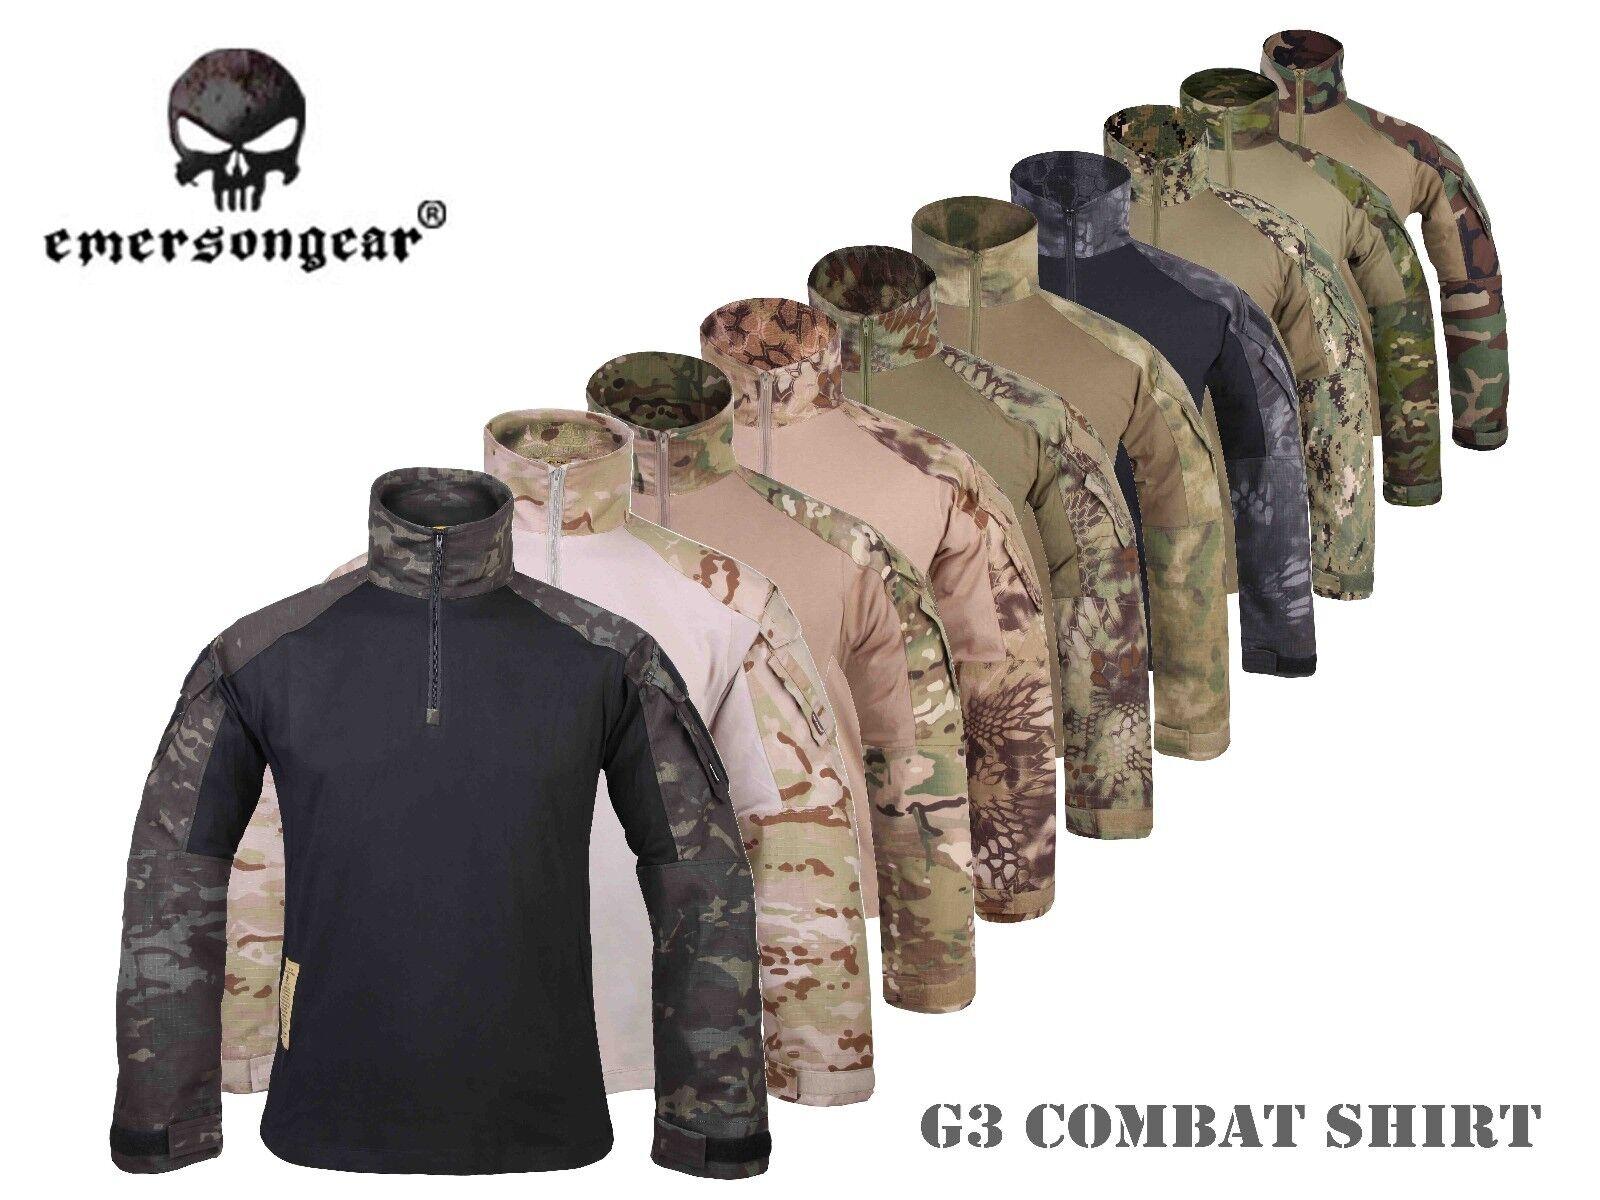 Men Airsoft Hunting Tactical bdu Shirt Emerson Combat Gen3 Shirt